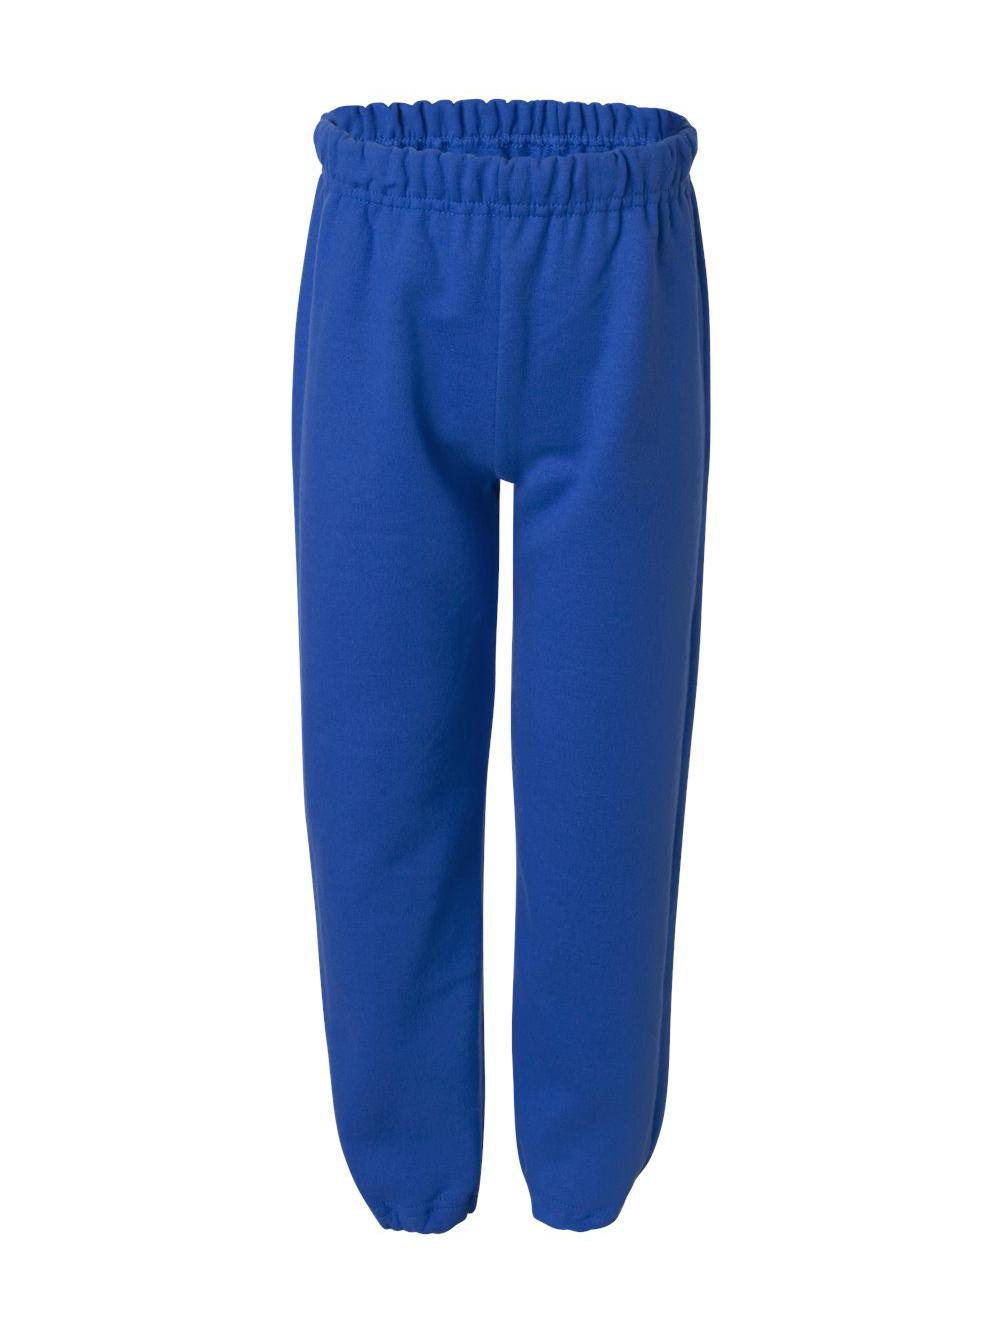 Gildan-Heavy-Blend-Youth-Sweatpants-18200B thumbnail 15